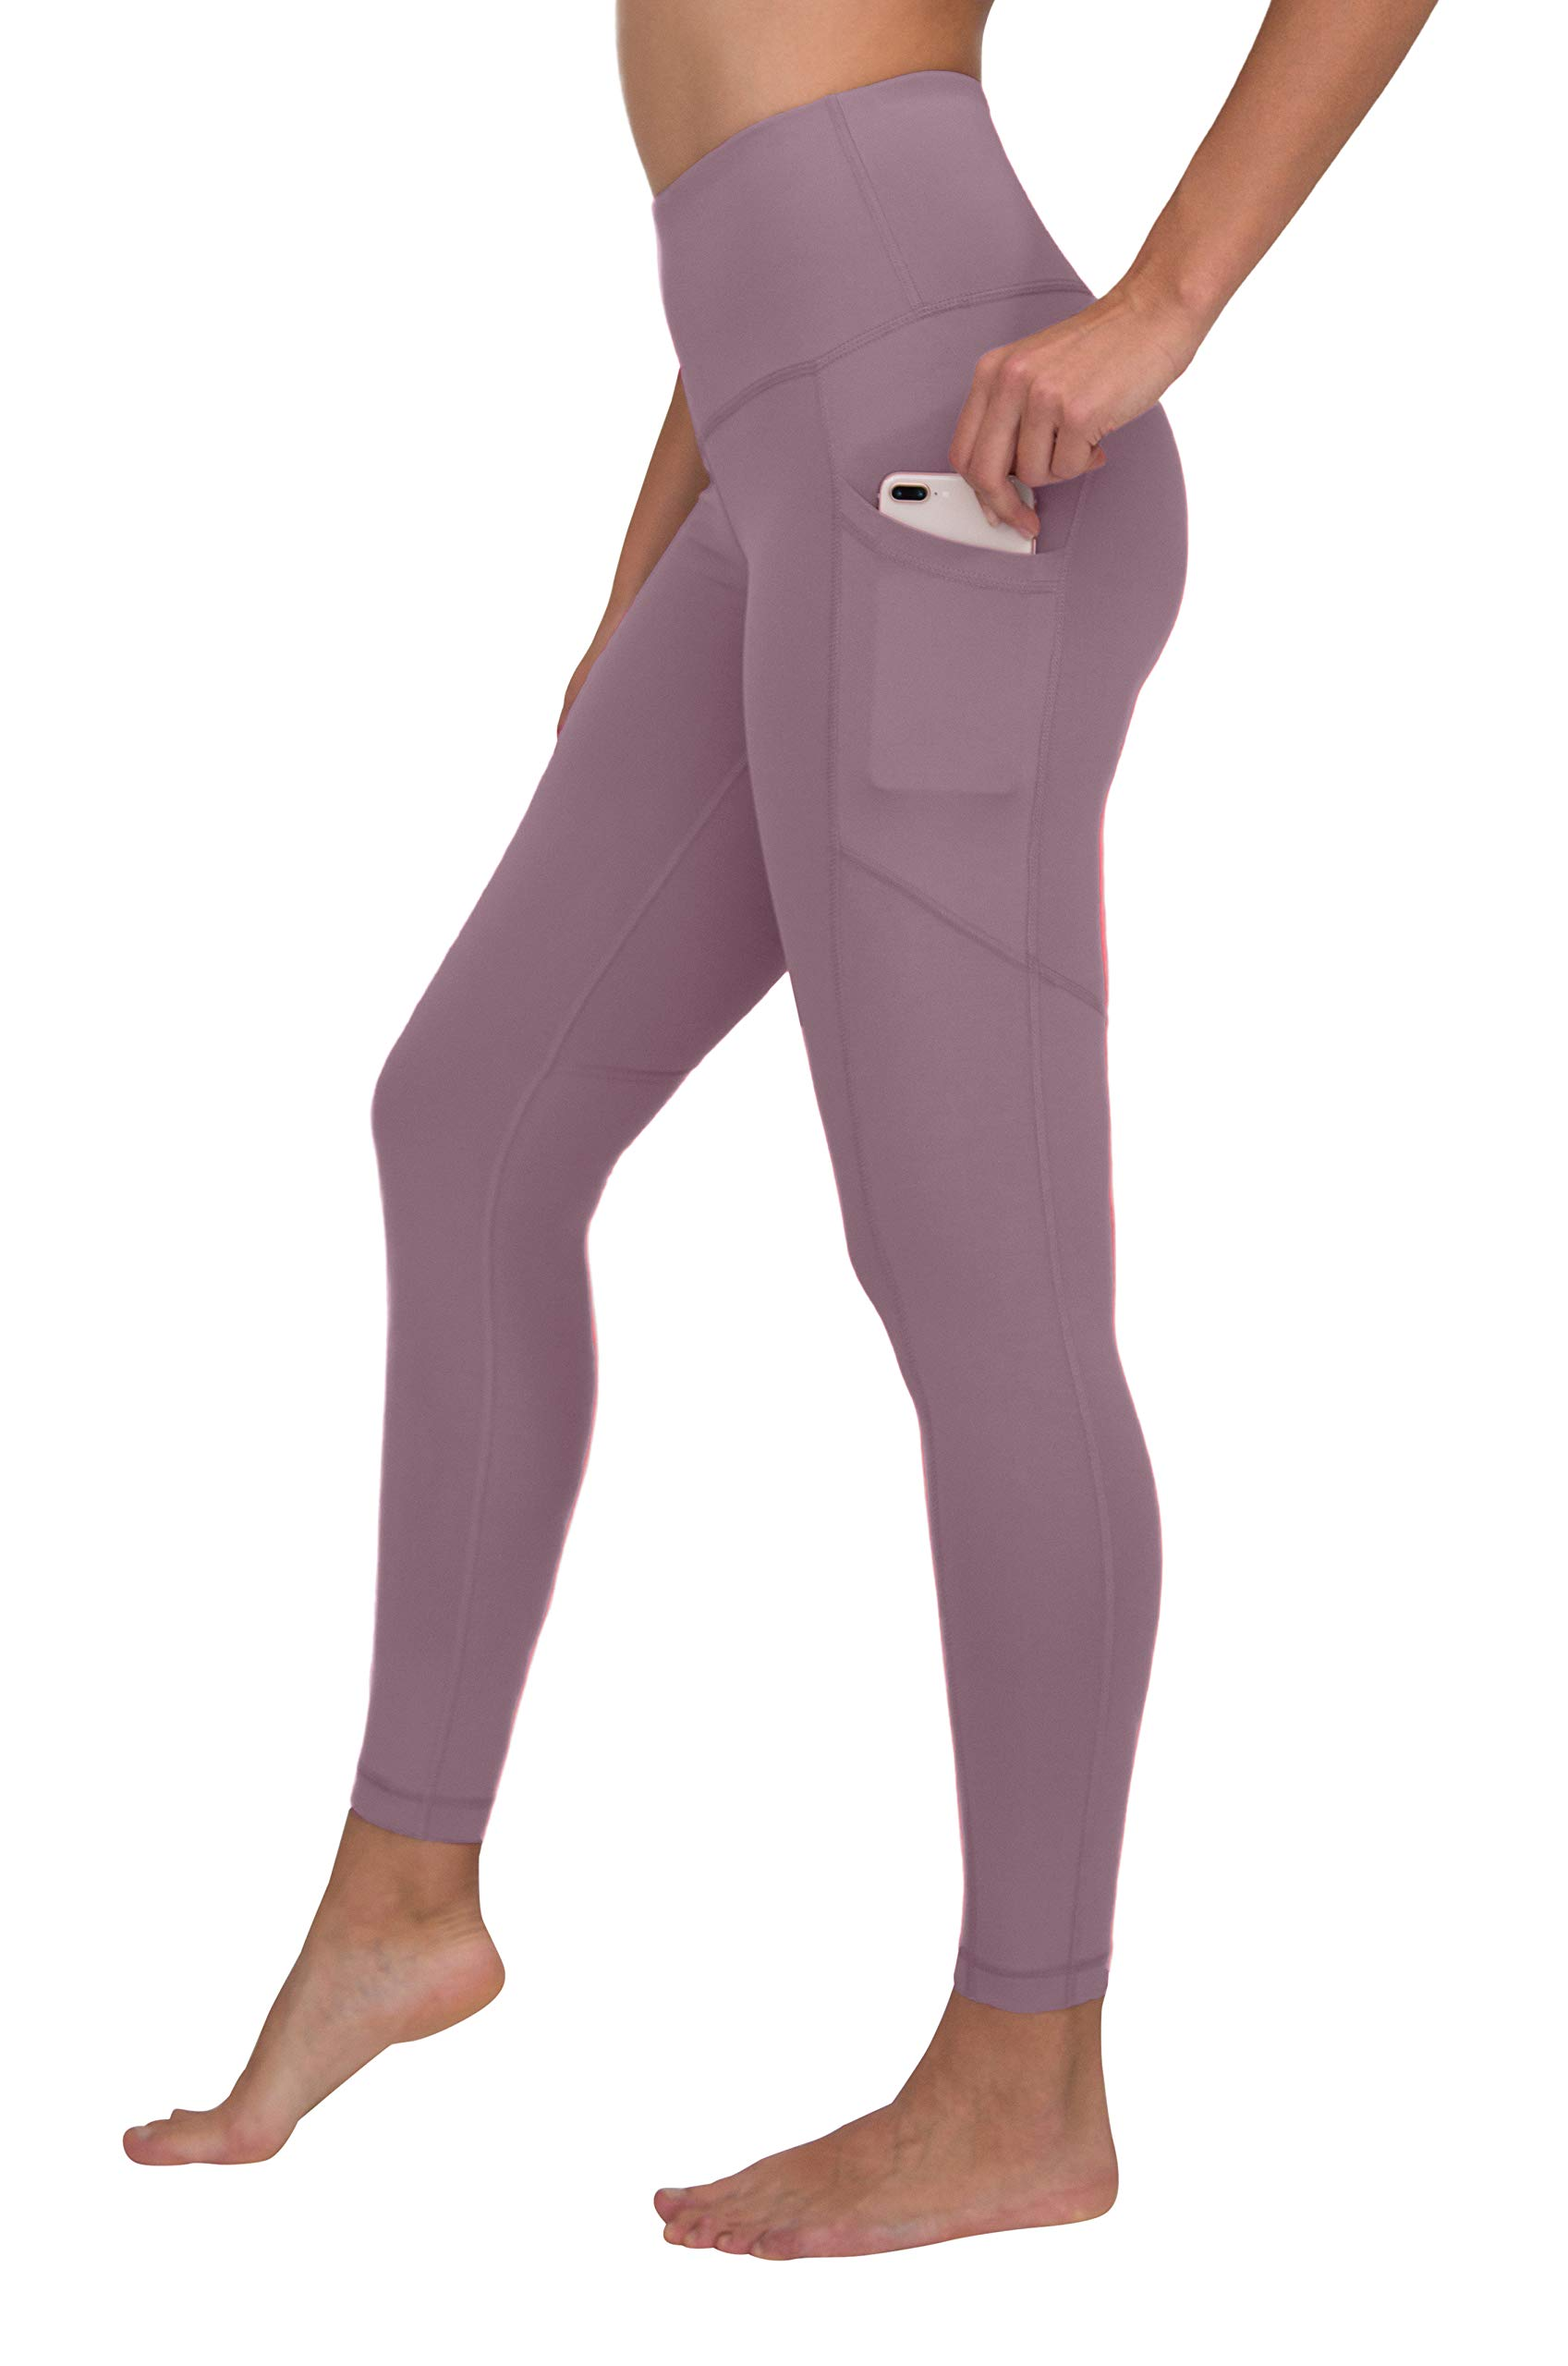 90 Degree By Reflex Women's Power Flex Yoga Pants - Arctic Dusk - XL by 90 Degree By Reflex